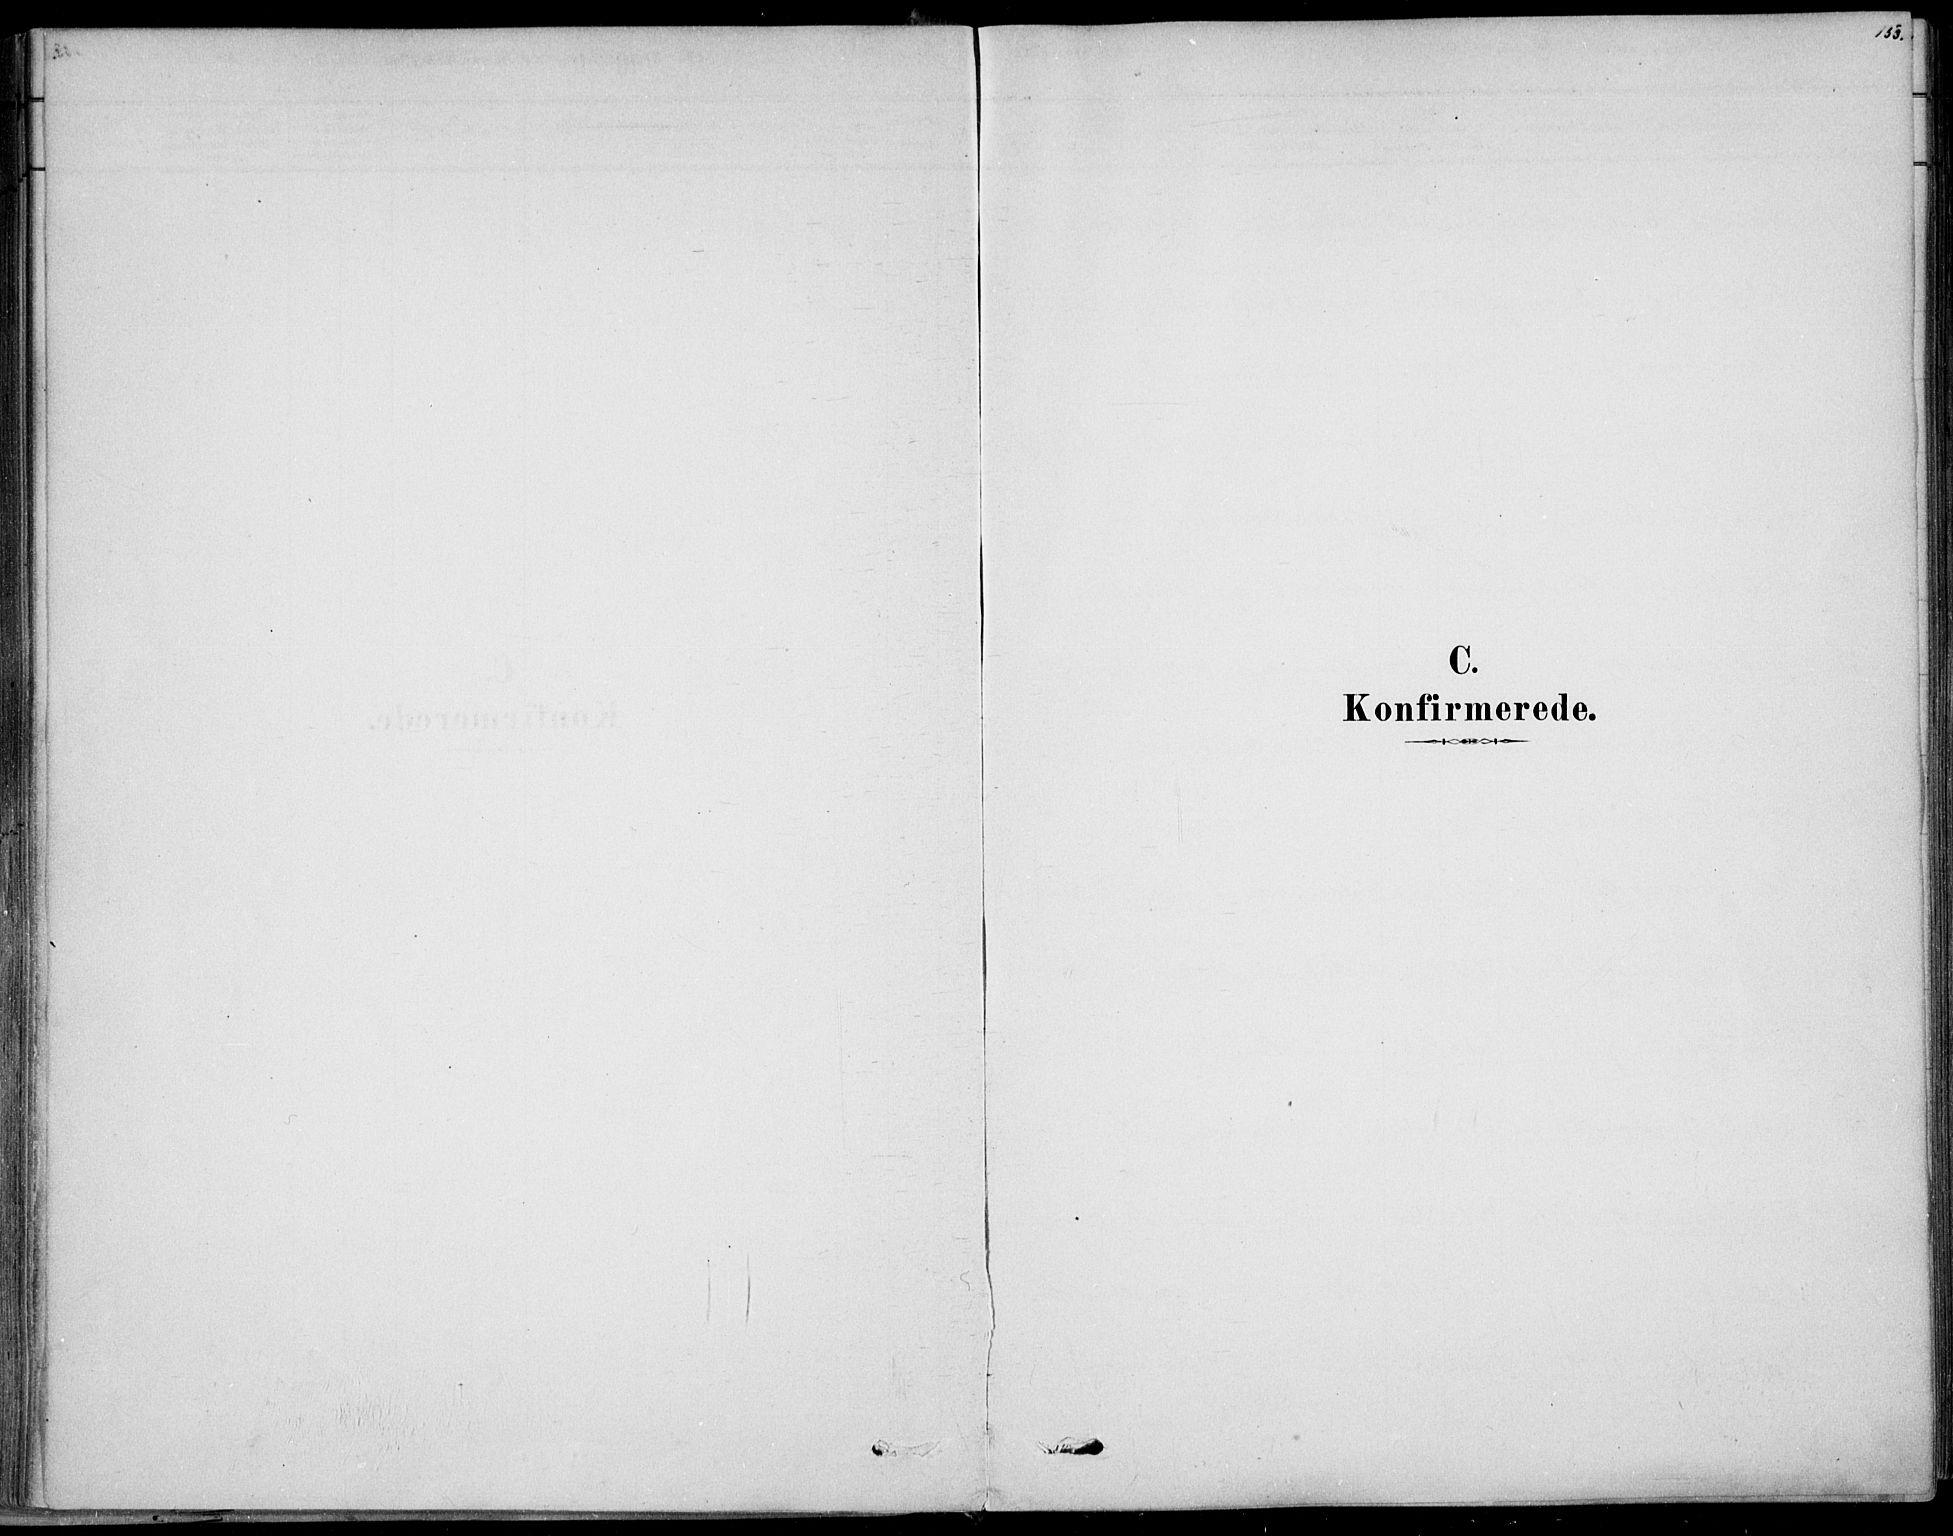 SAKO, Sem kirkebøker, F/Fb/L0004: Ministerialbok nr. II 4, 1878-1891, s. 153